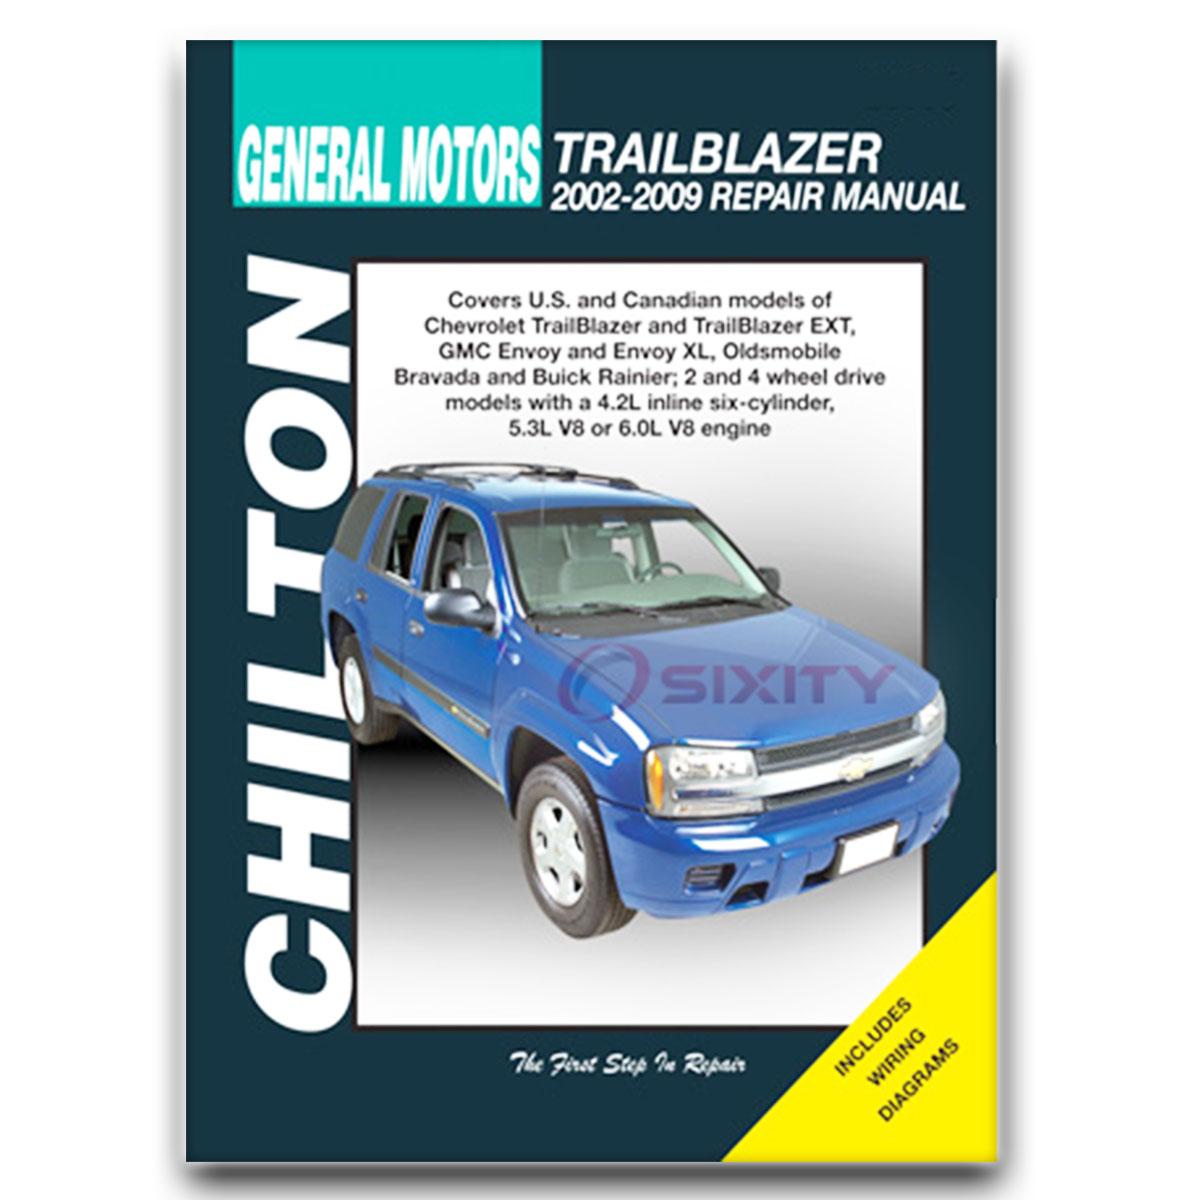 Buick Rainier Chilton Repair Manual Cxl Plus Shop Service border=